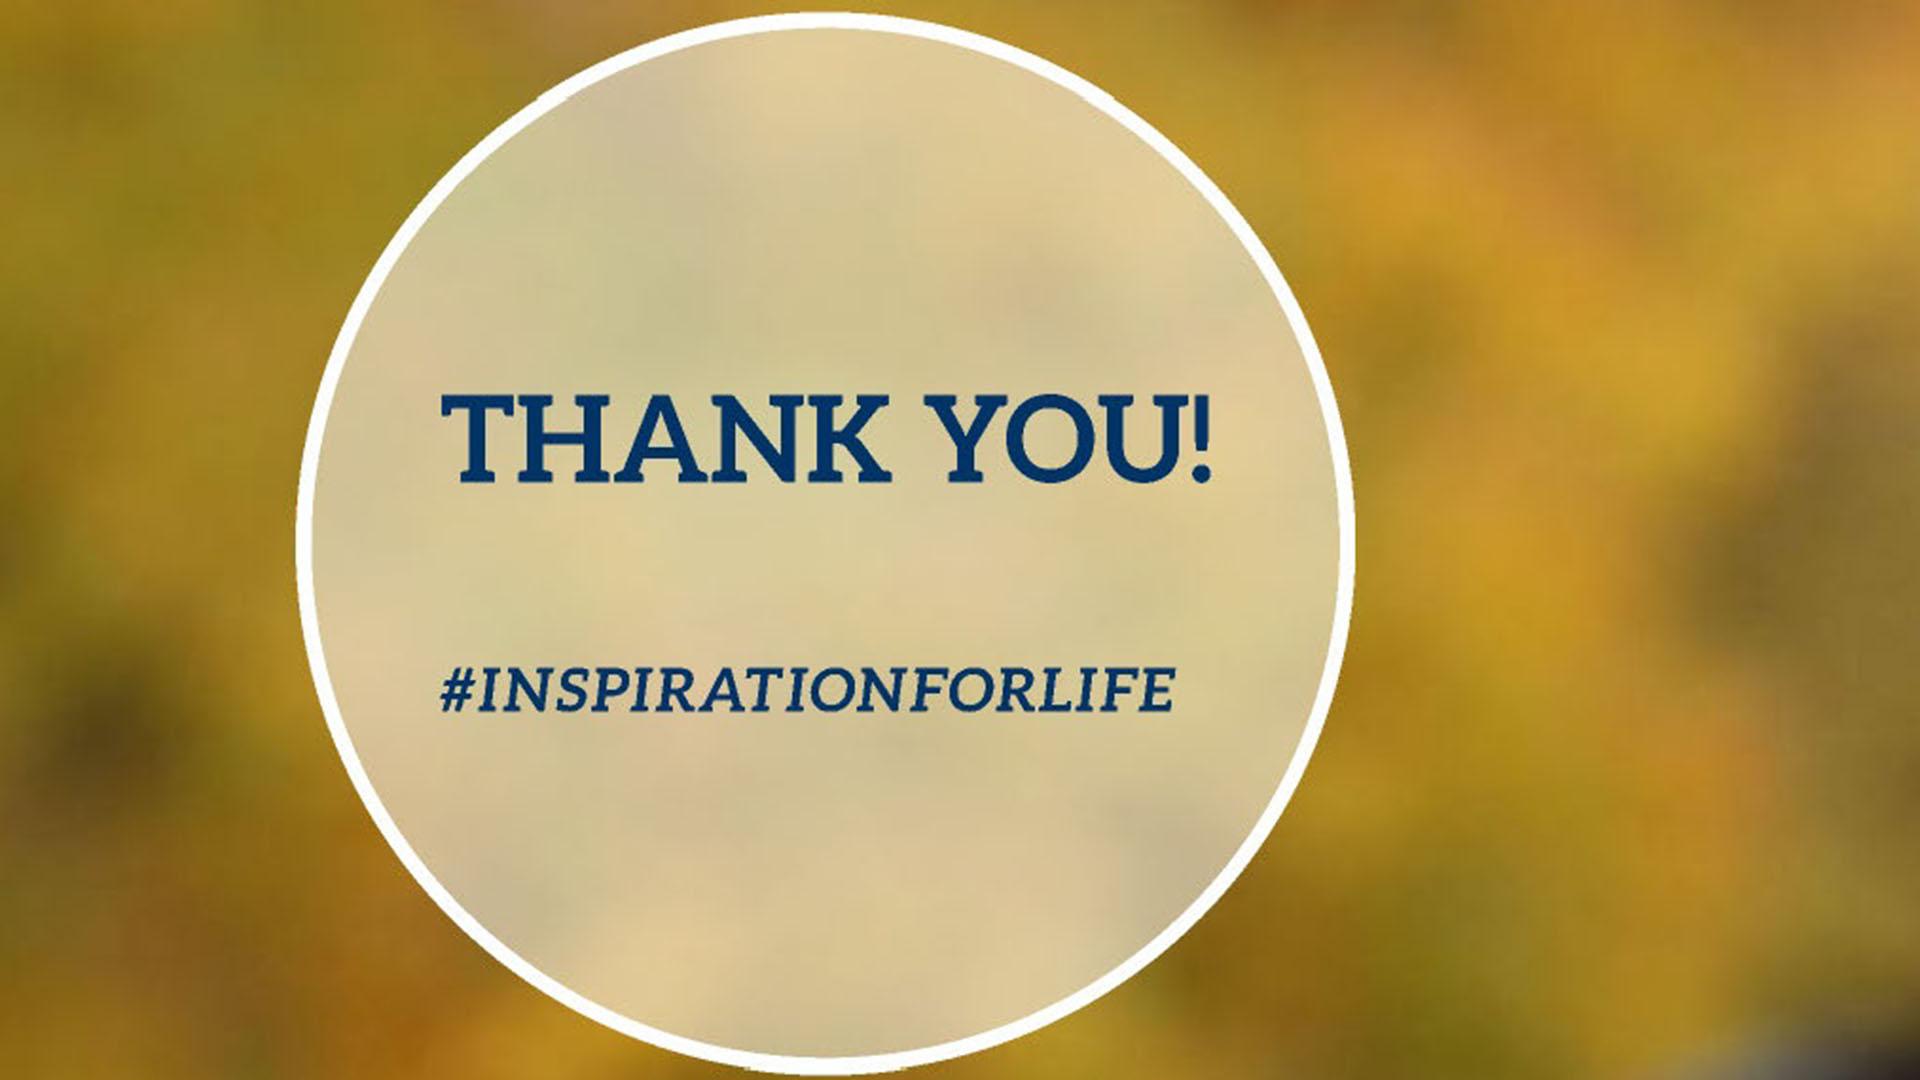 THANK YOU! #InspirationForLife